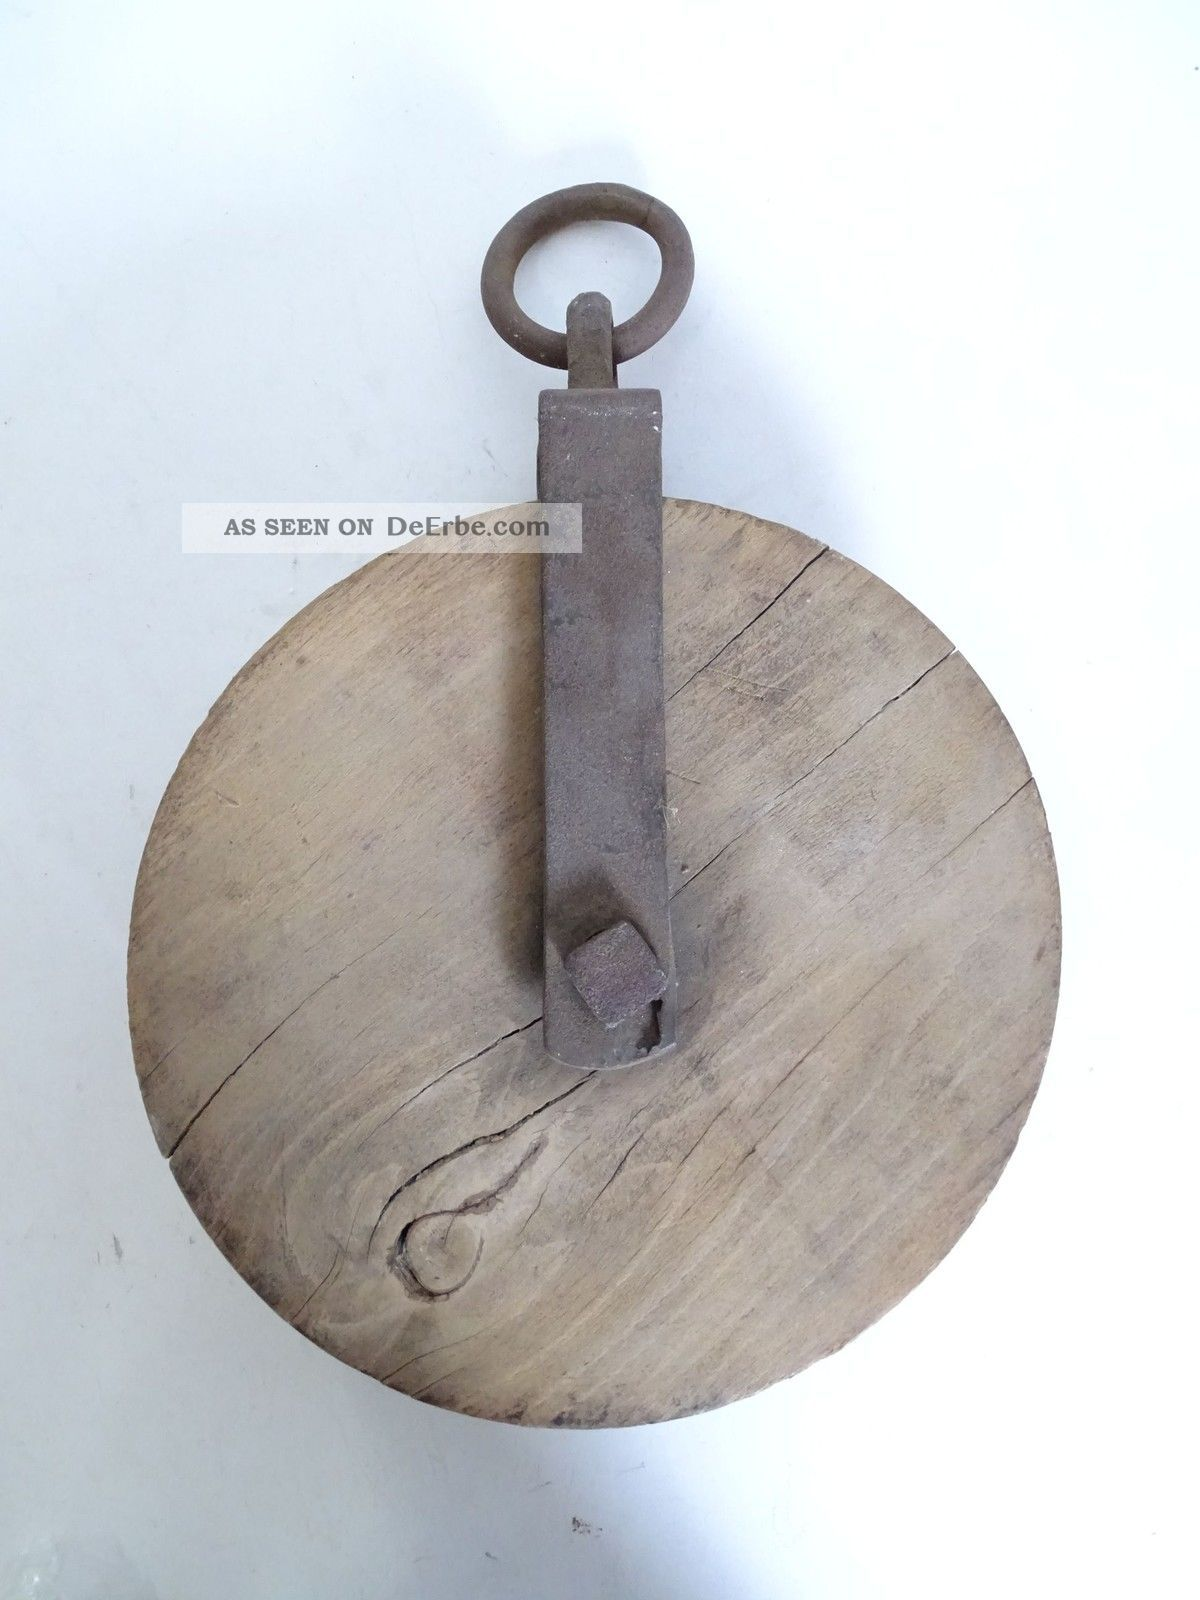 Antike Umlenkrolle Seilwinde Seilzug Rolle Holz Metall Rarität Flaschenzug Bauer Bild